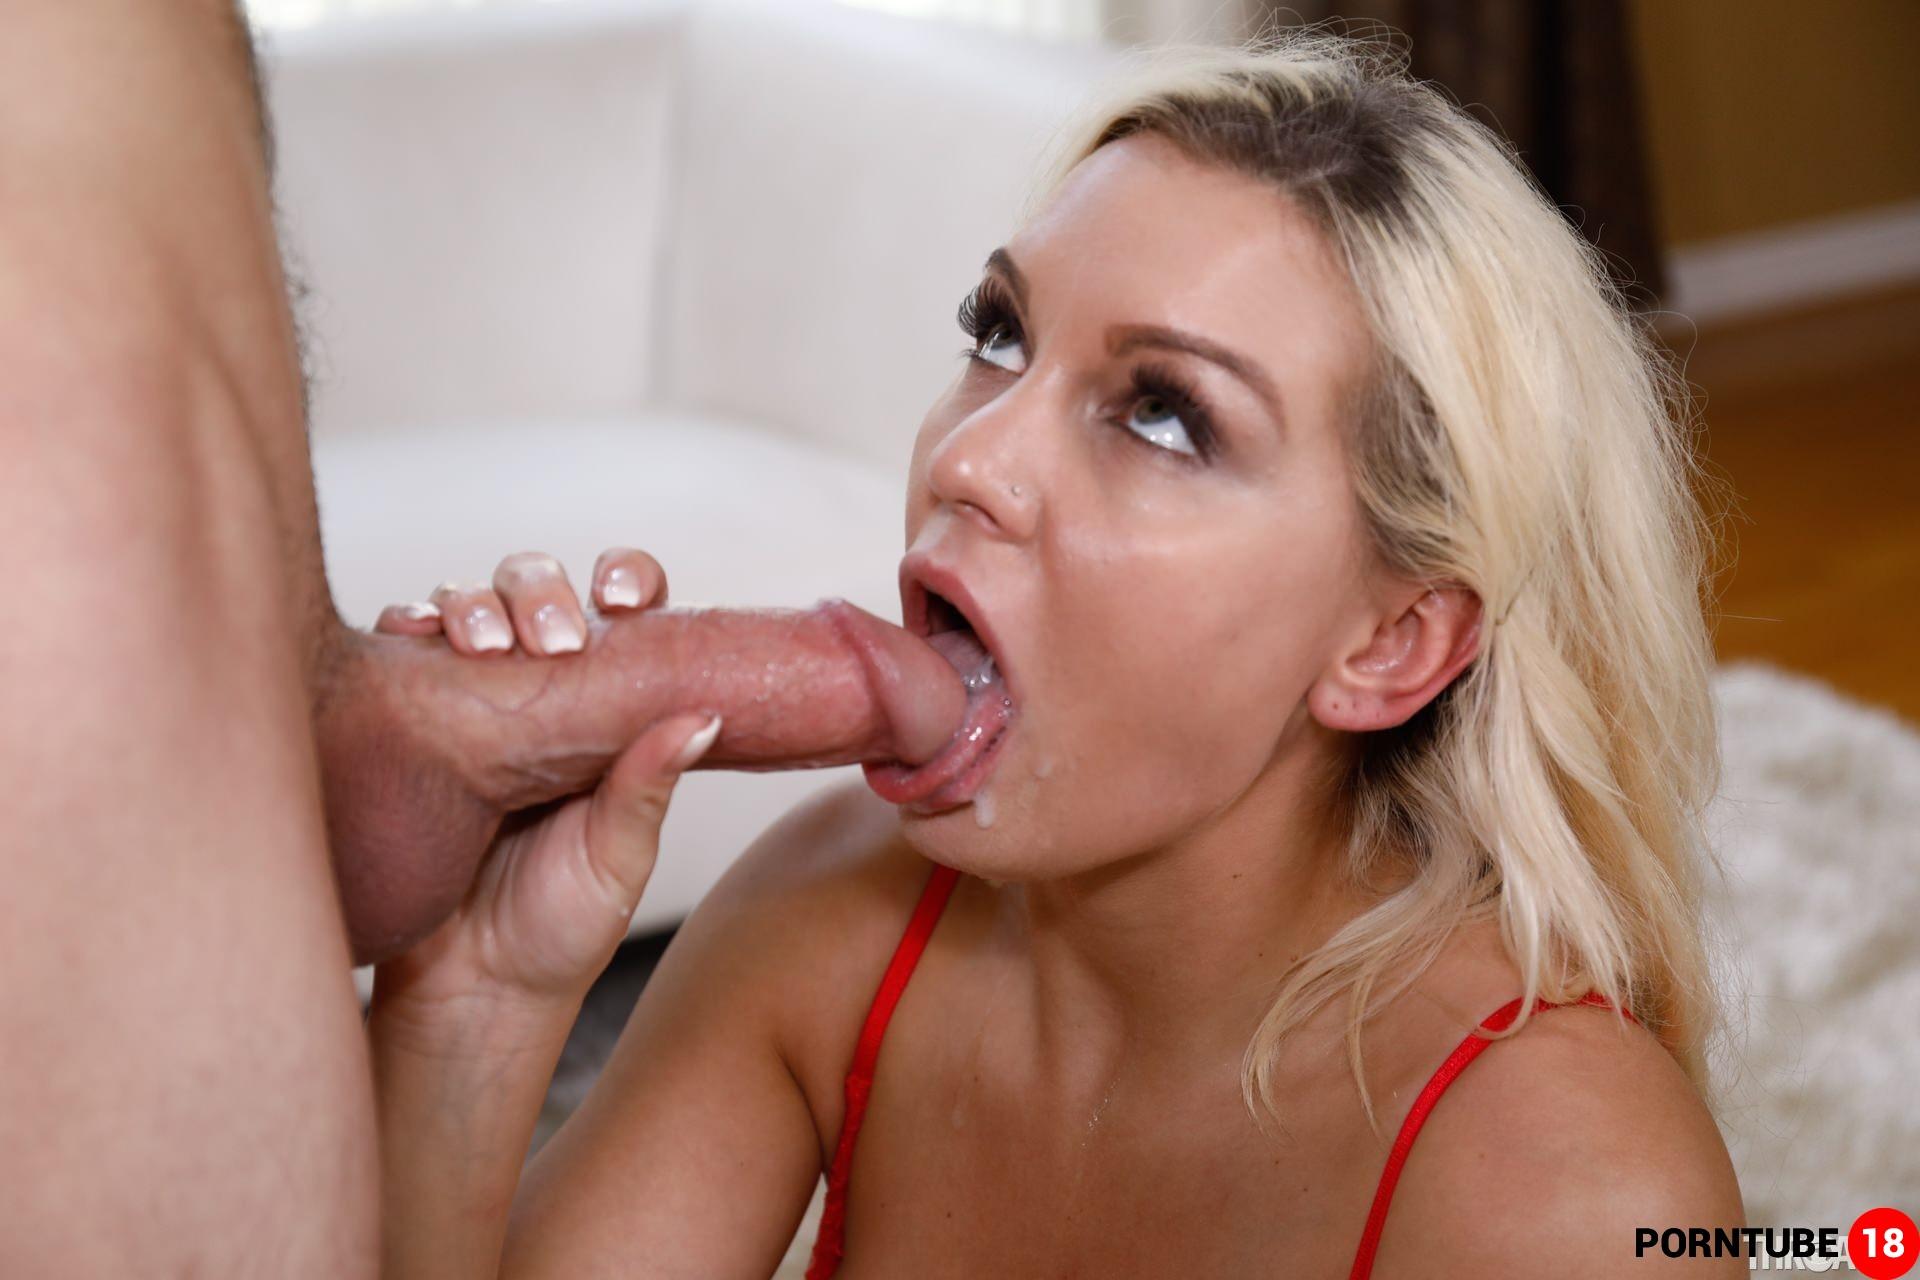 Asslicious blonde kaylee evans in red thong redhub